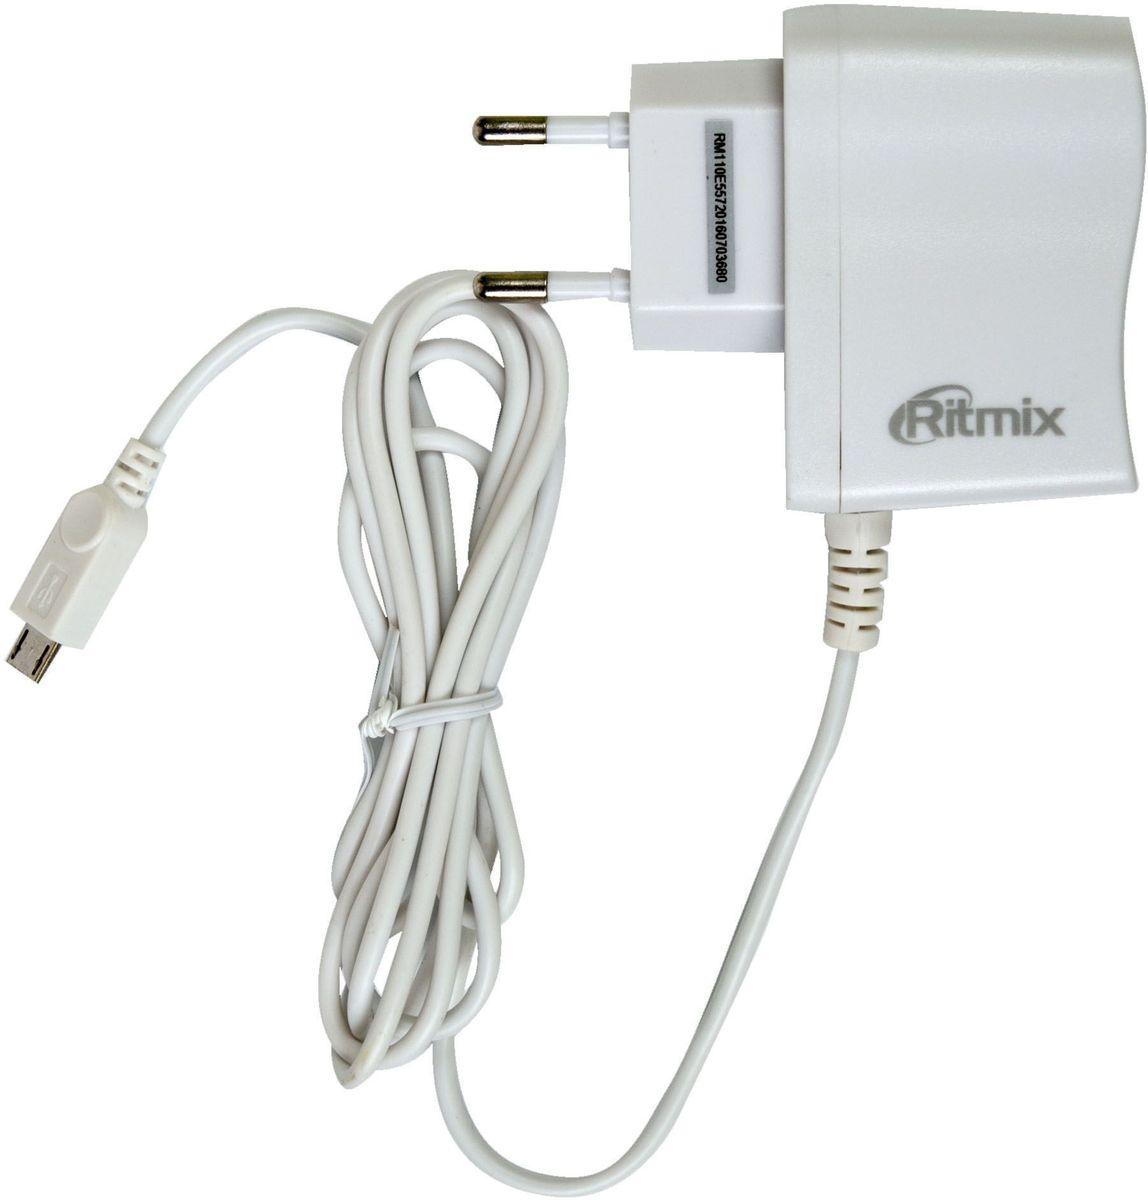 Ritmix RM-110, White сетевое зарядное устройство15118260(ECO AC) 1A, 1 x micro USB сетевое зарядное устройство, интерфейс micro USB, напряжение (вход) 100-240V AC, ток (вход) 0,15А, напряжение (выход) 5V DC, ток заряда 1000 мА